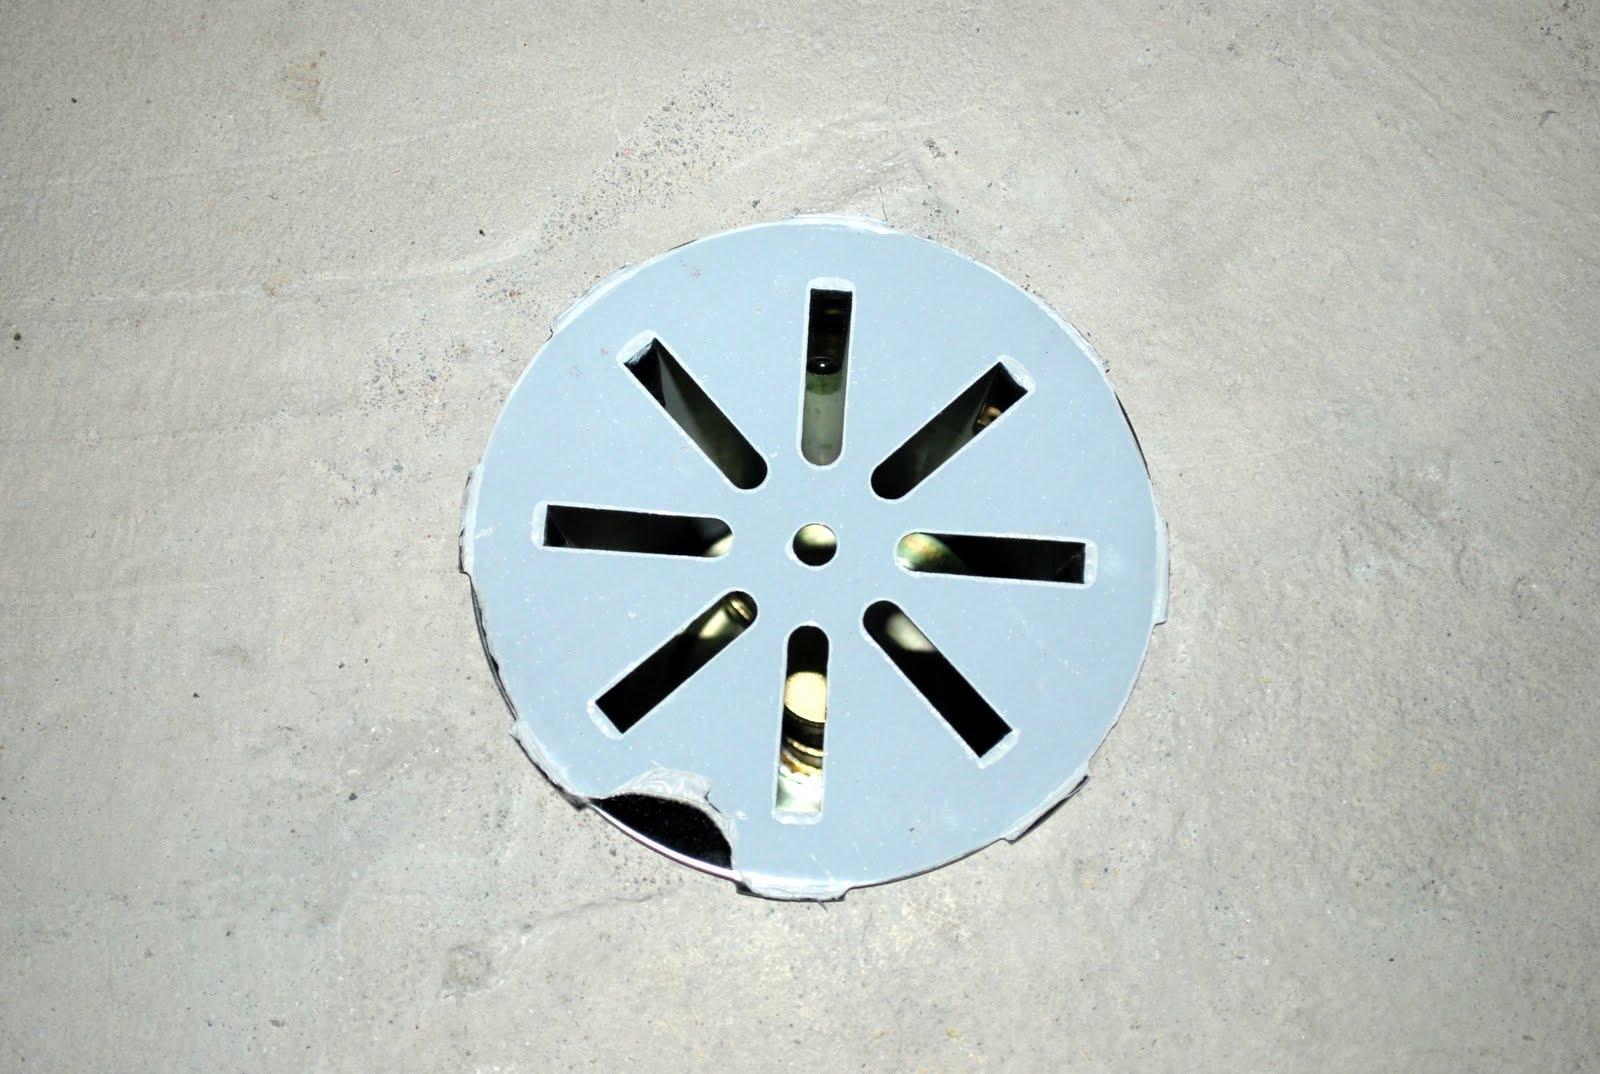 Basement Floor Drain Cover As An Important Part